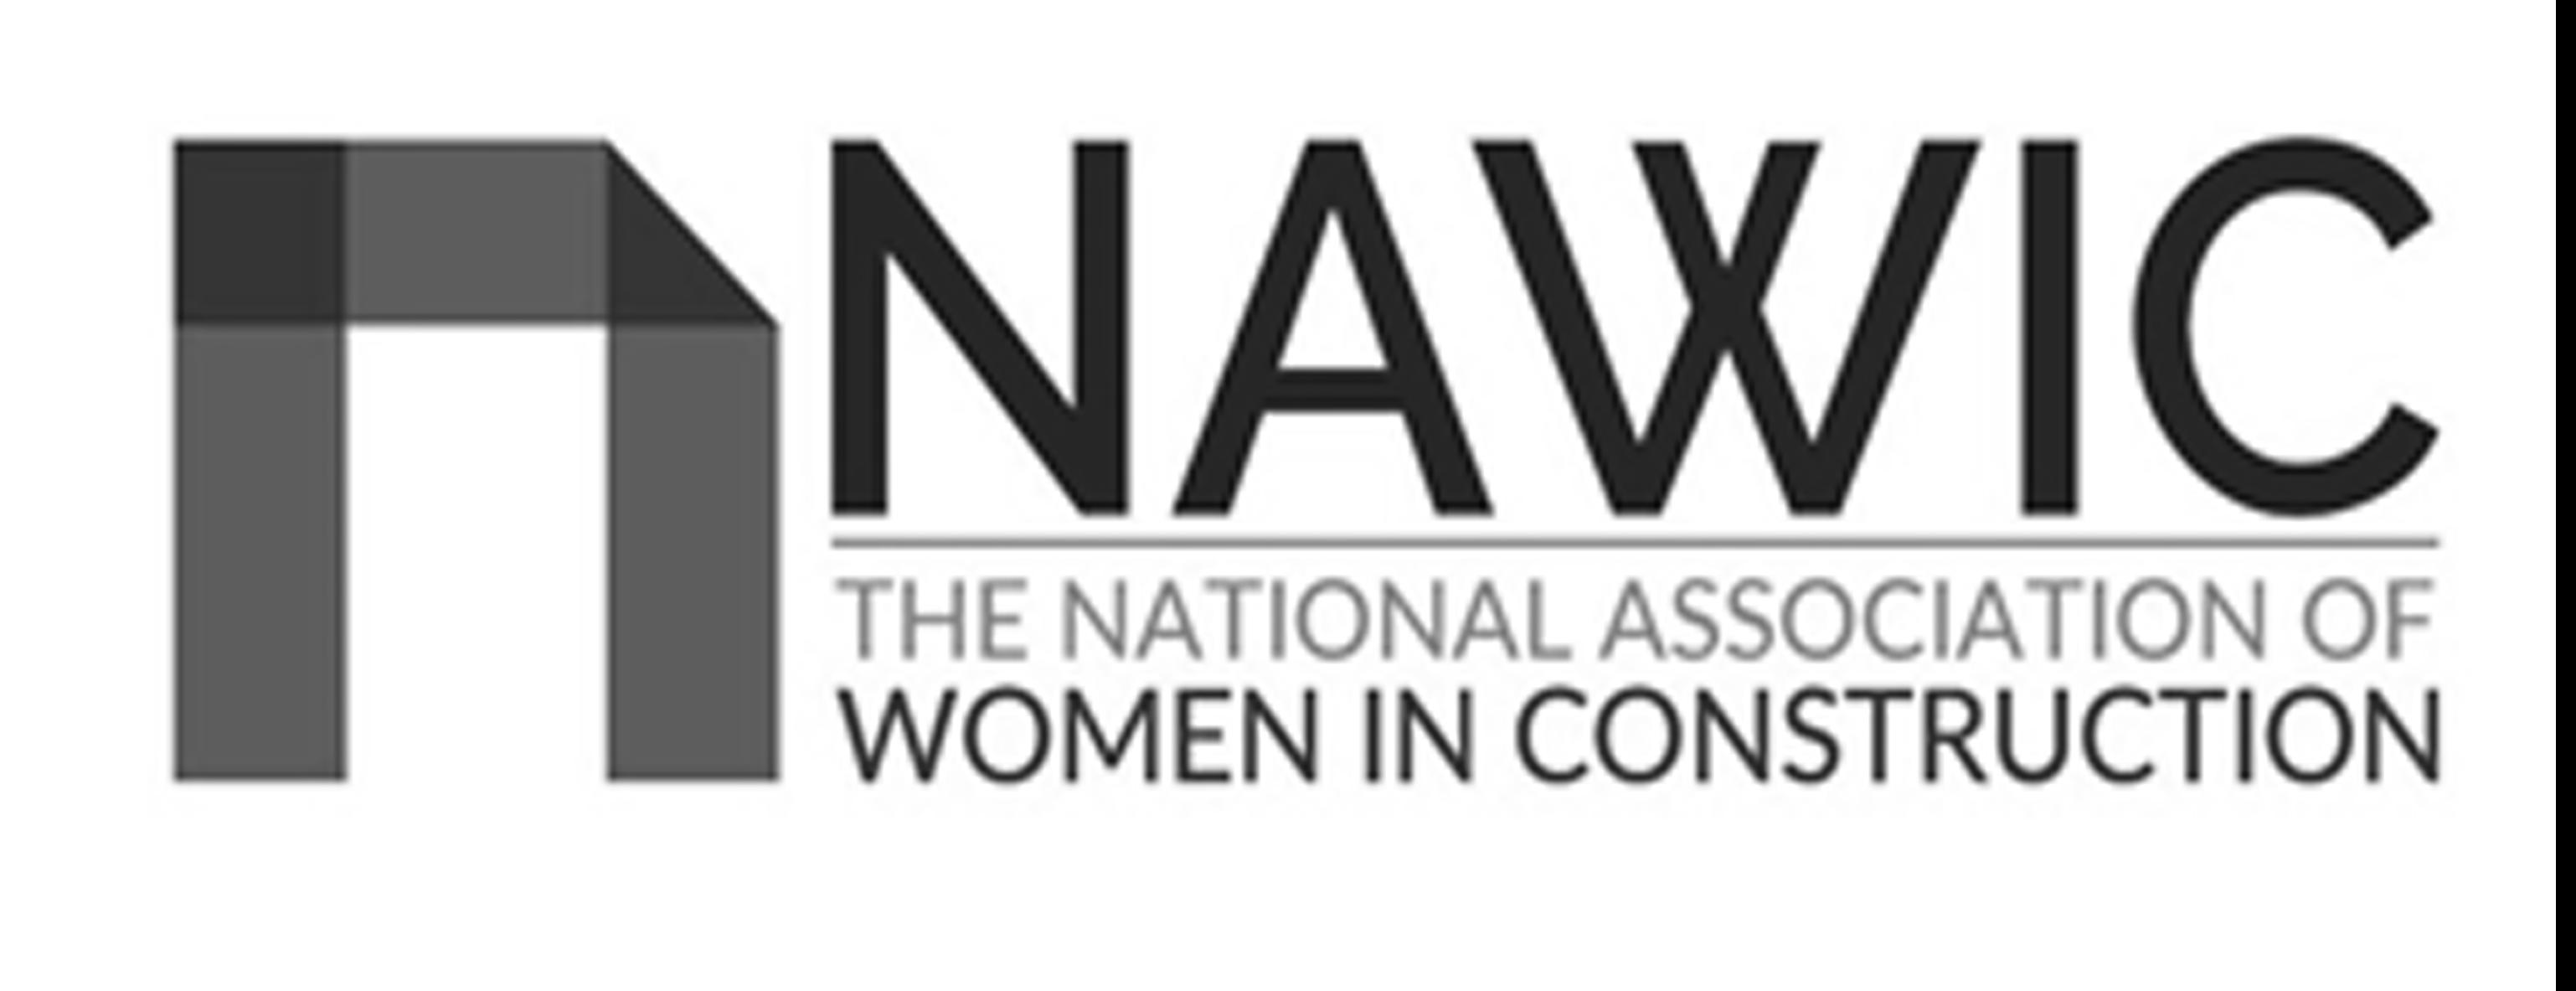 Affiliations Bijl NAWIC jpg